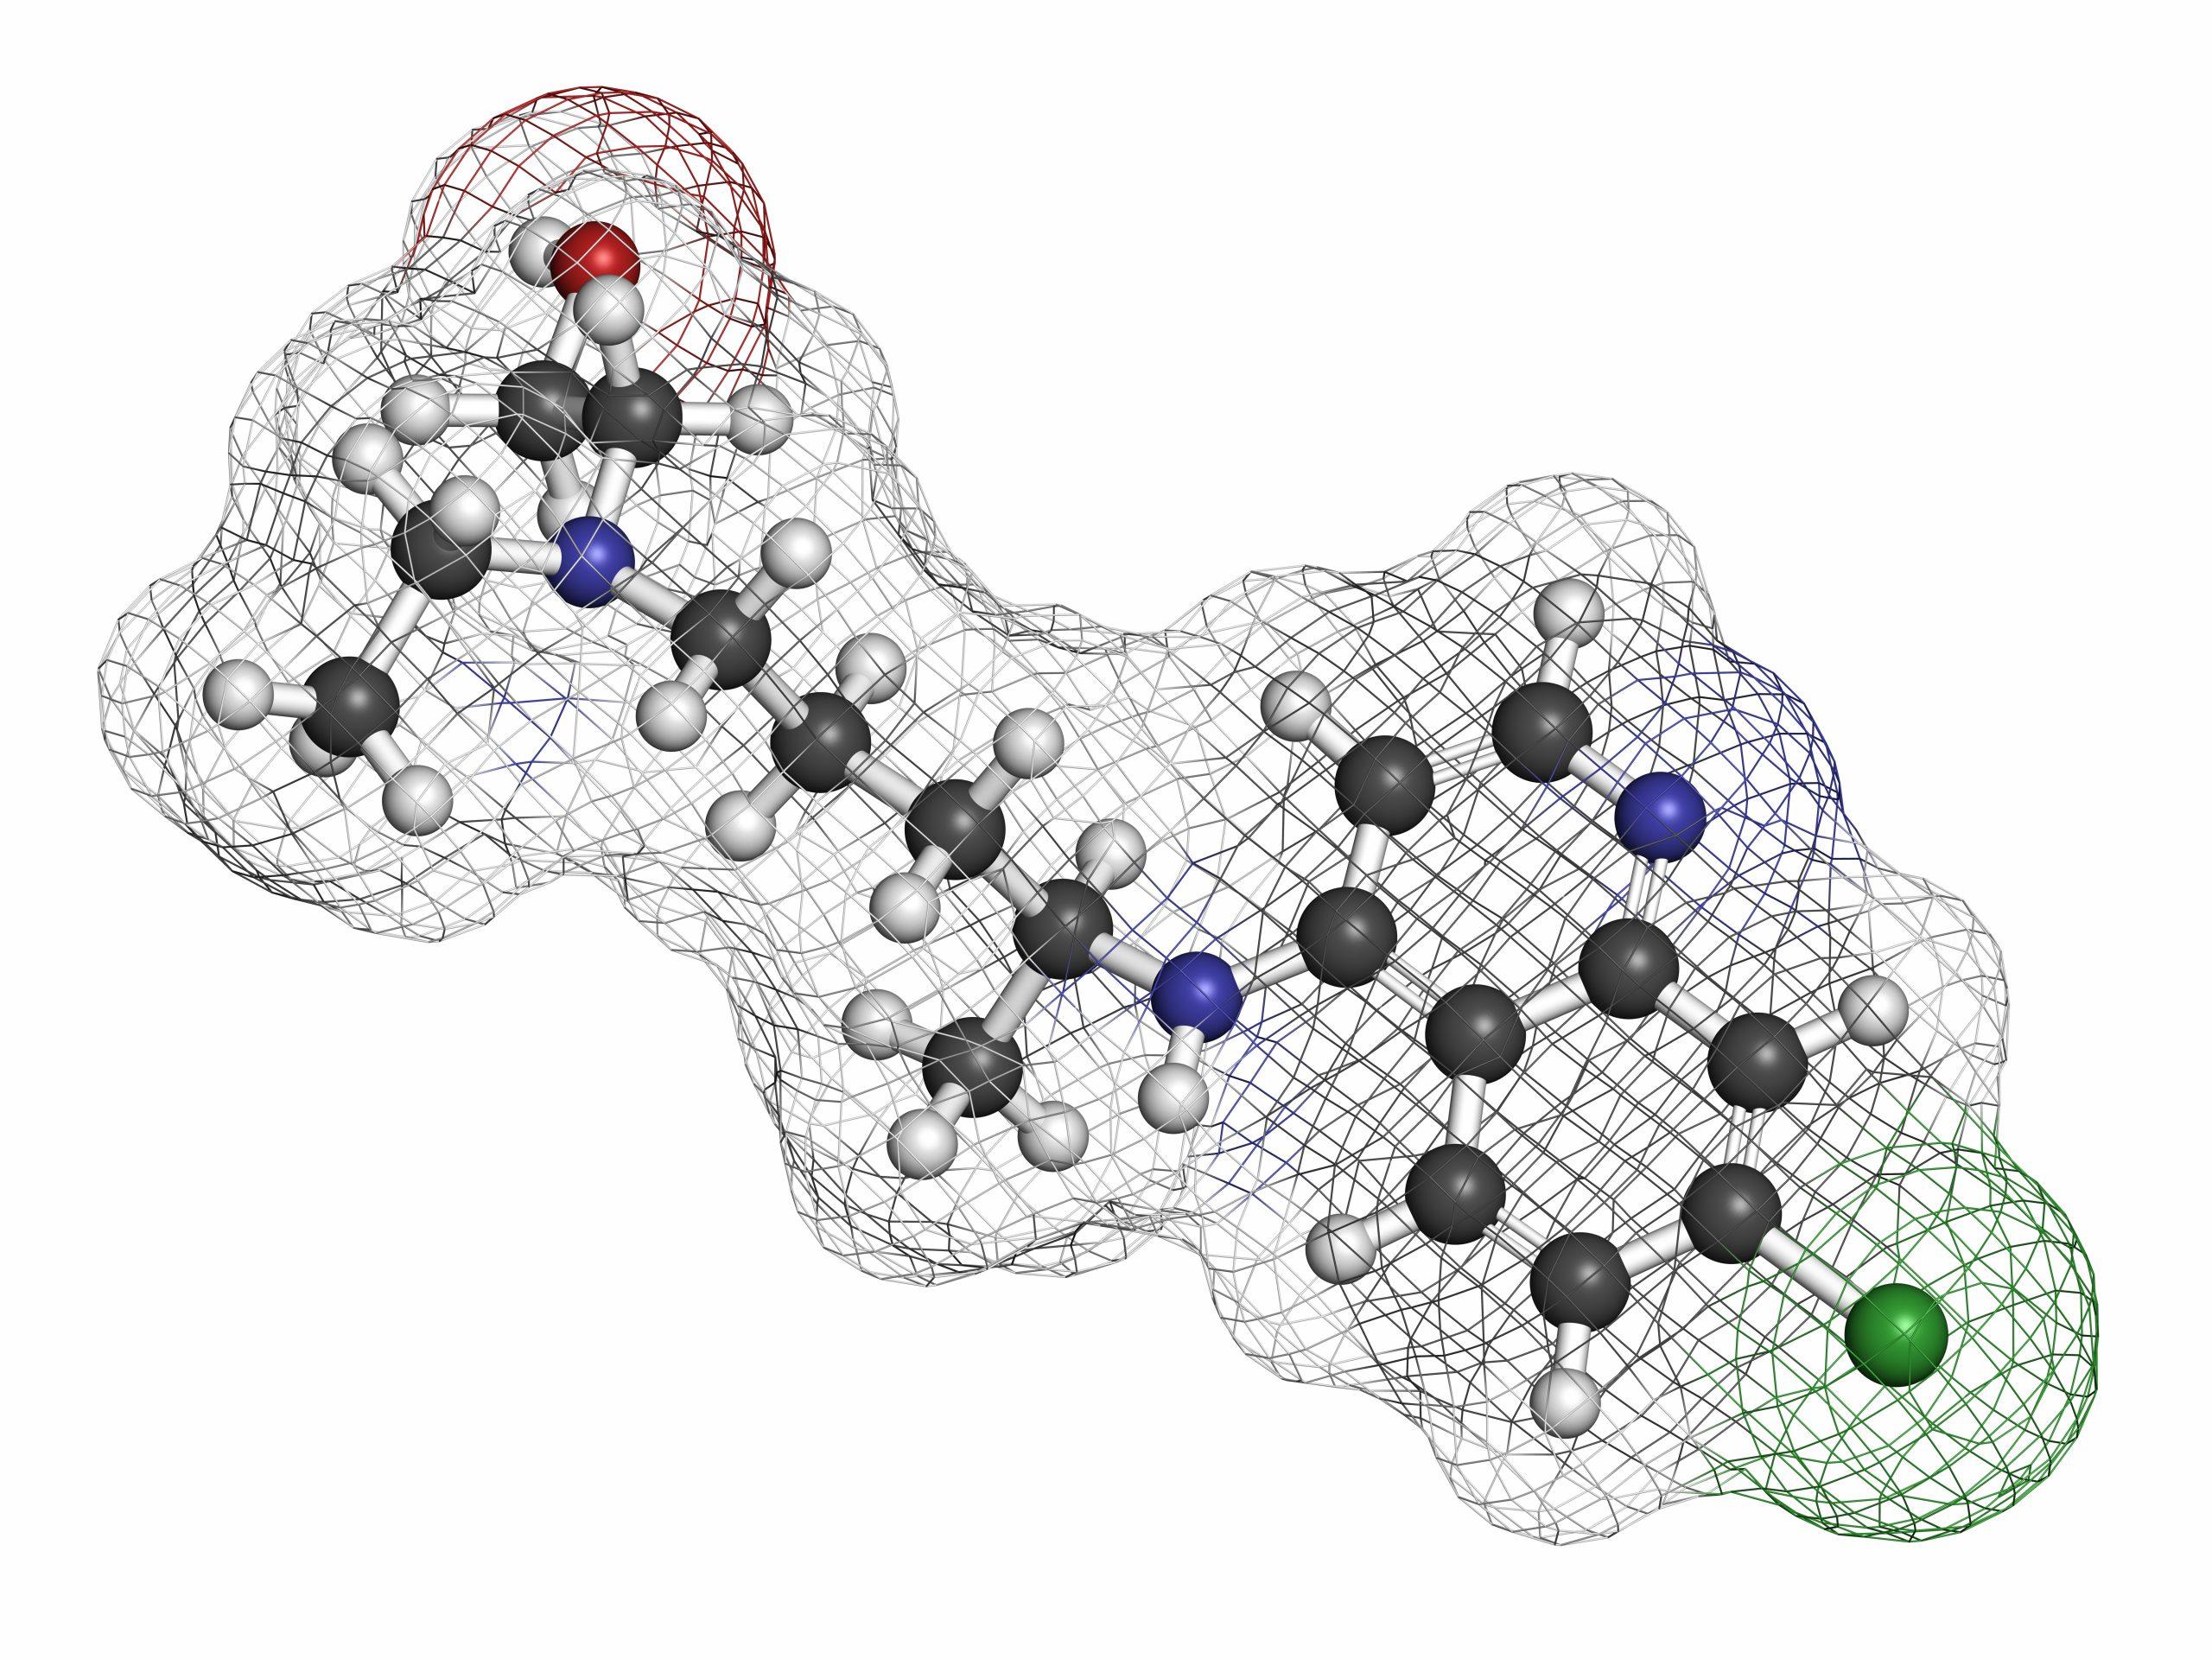 COVID-19: promising treatments begin to emerge